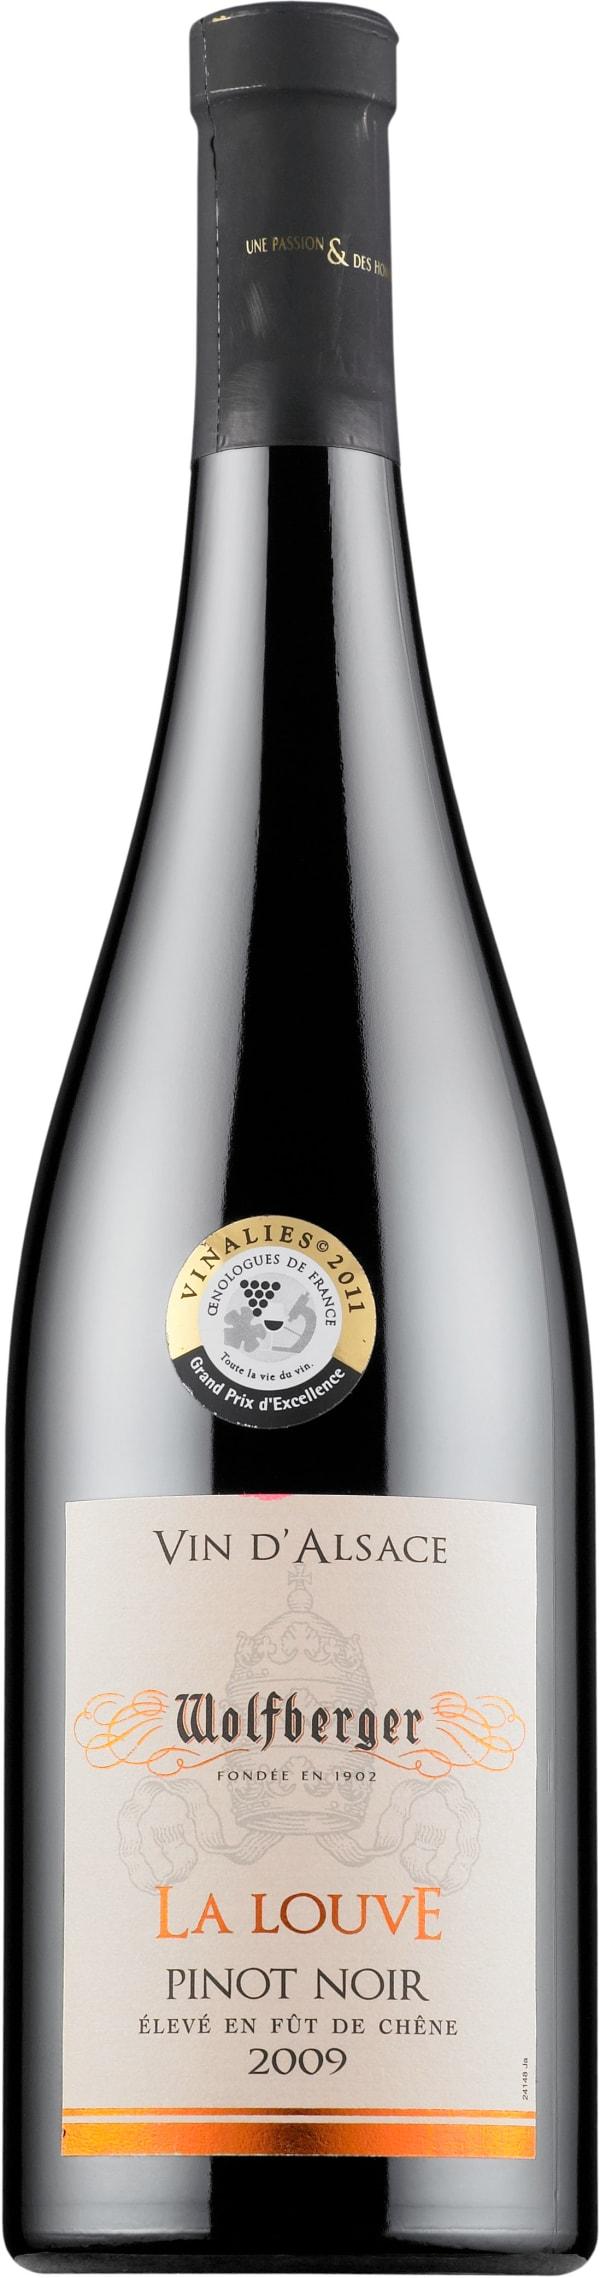 Wolfberger La Louve Pinot Noir 2017